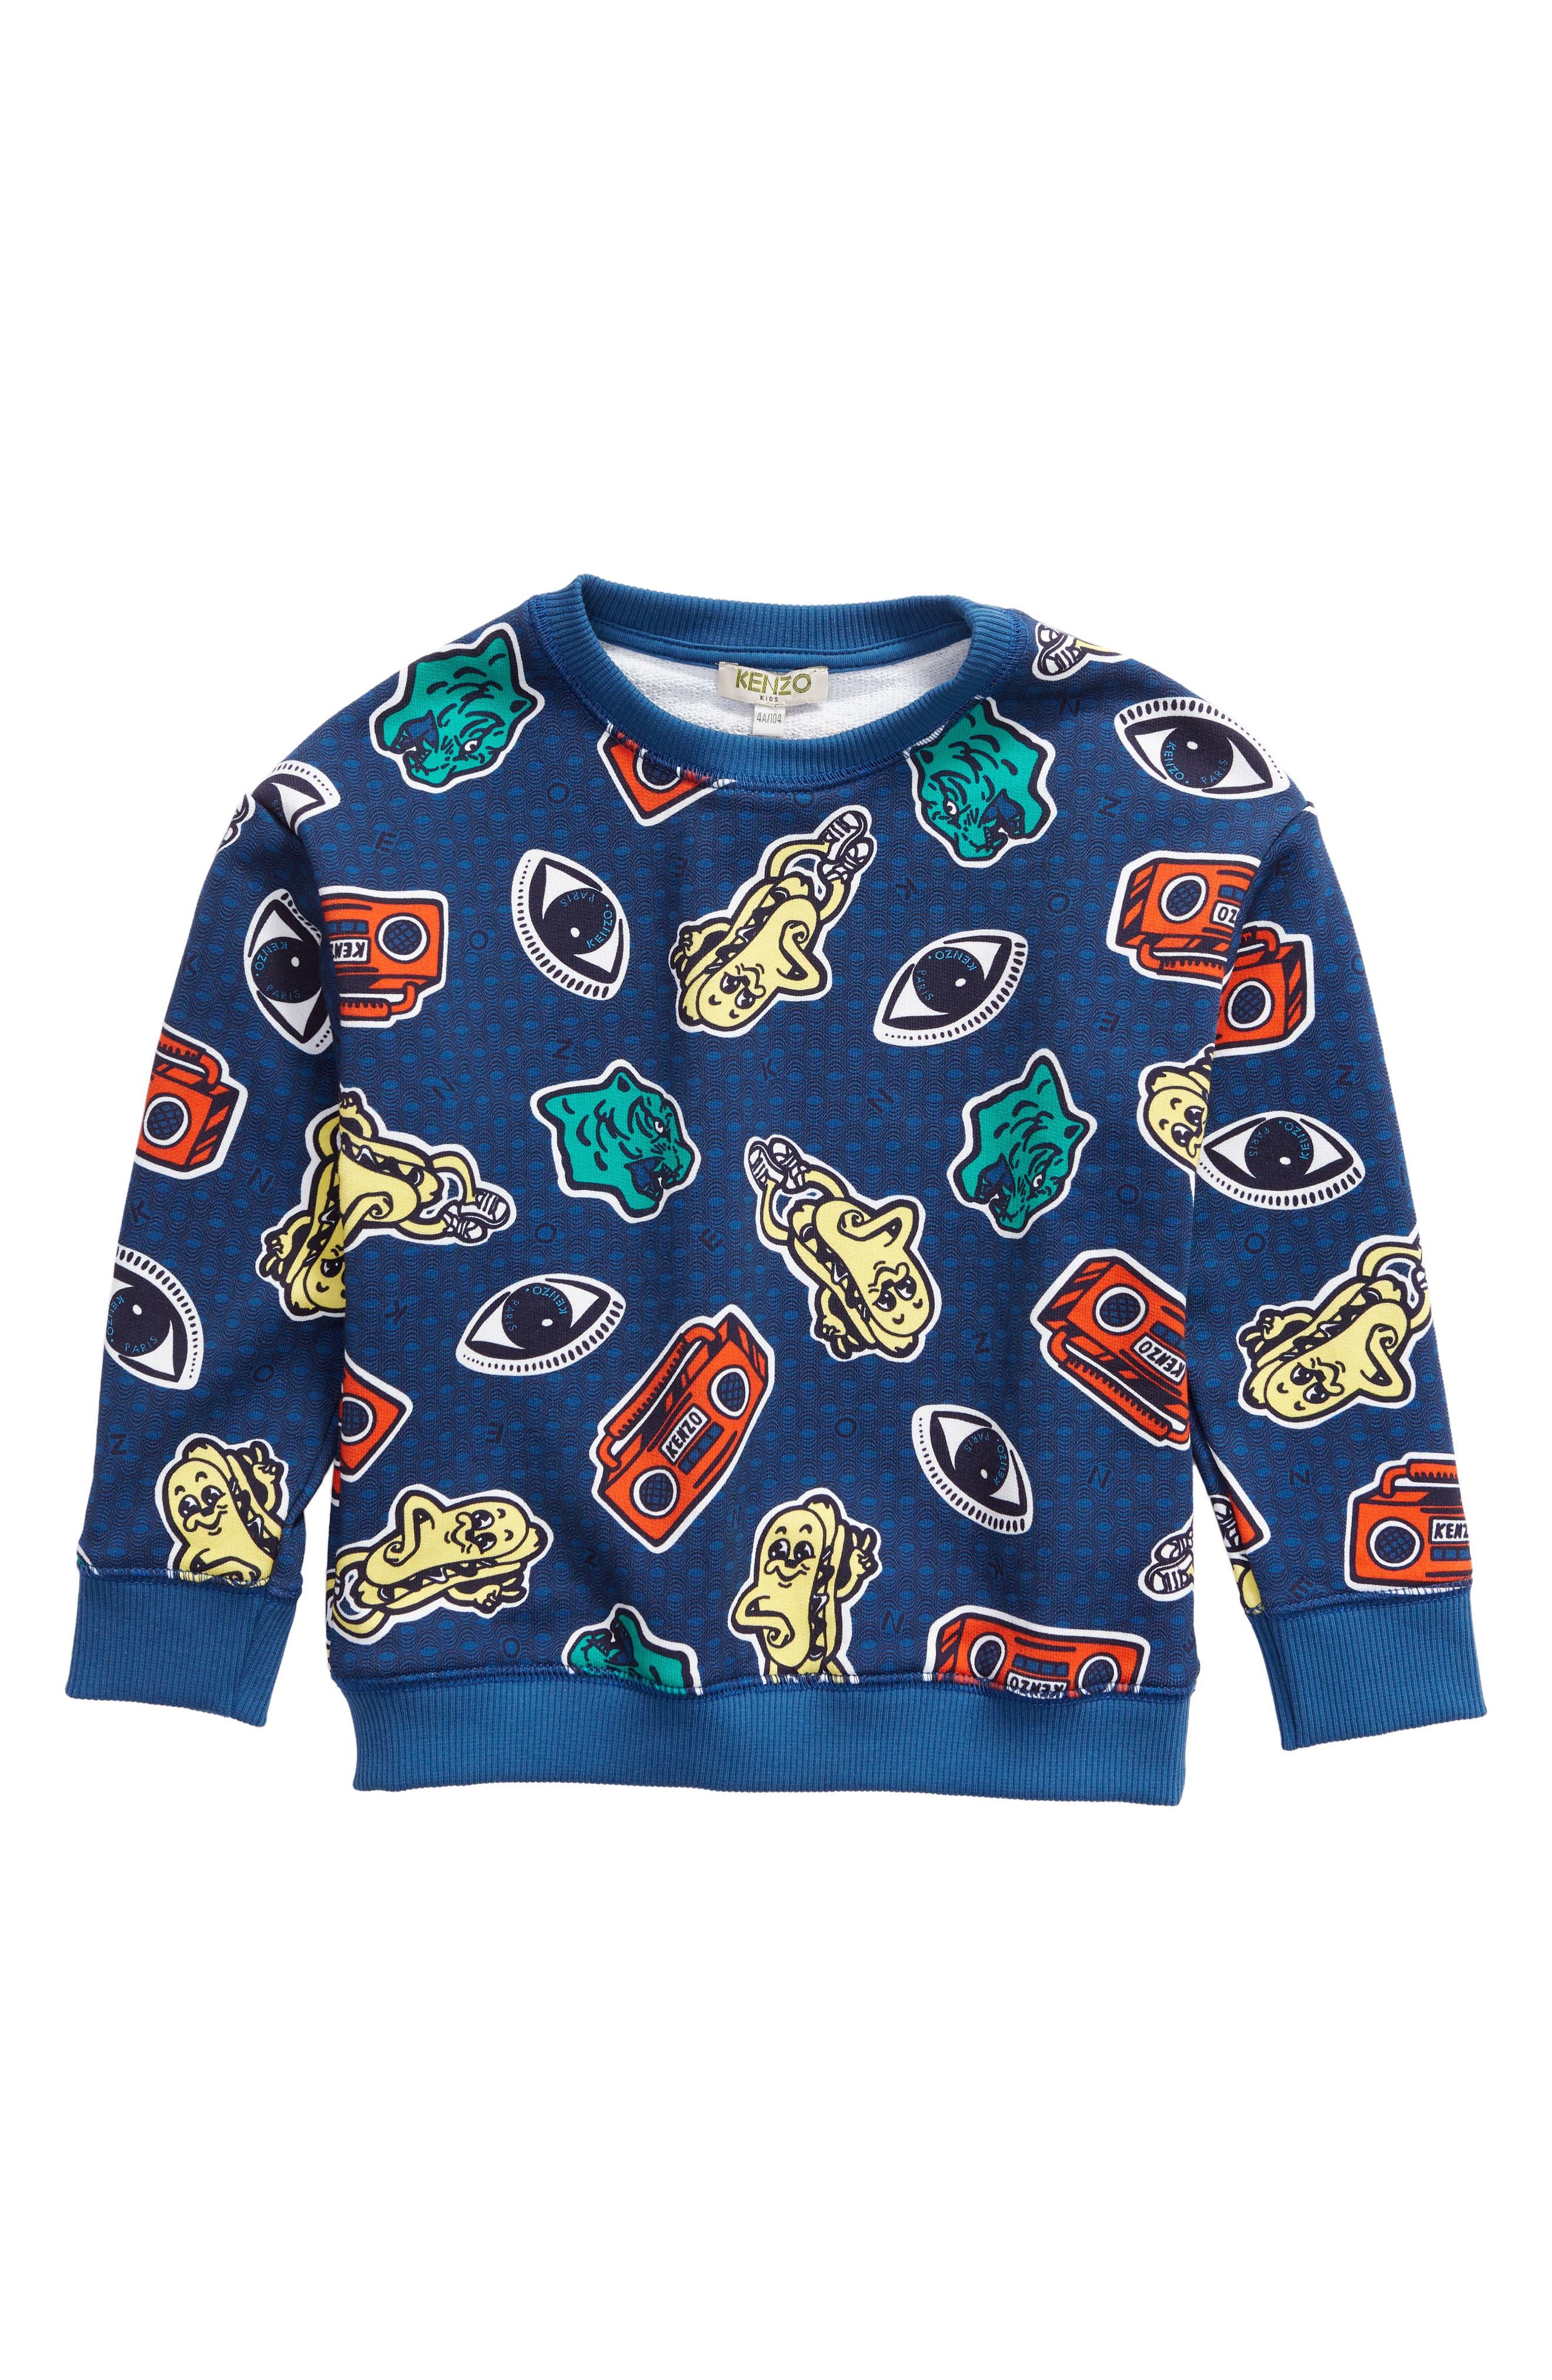 KENZO Print Sweatshirt, Main, color, DARK BLUE